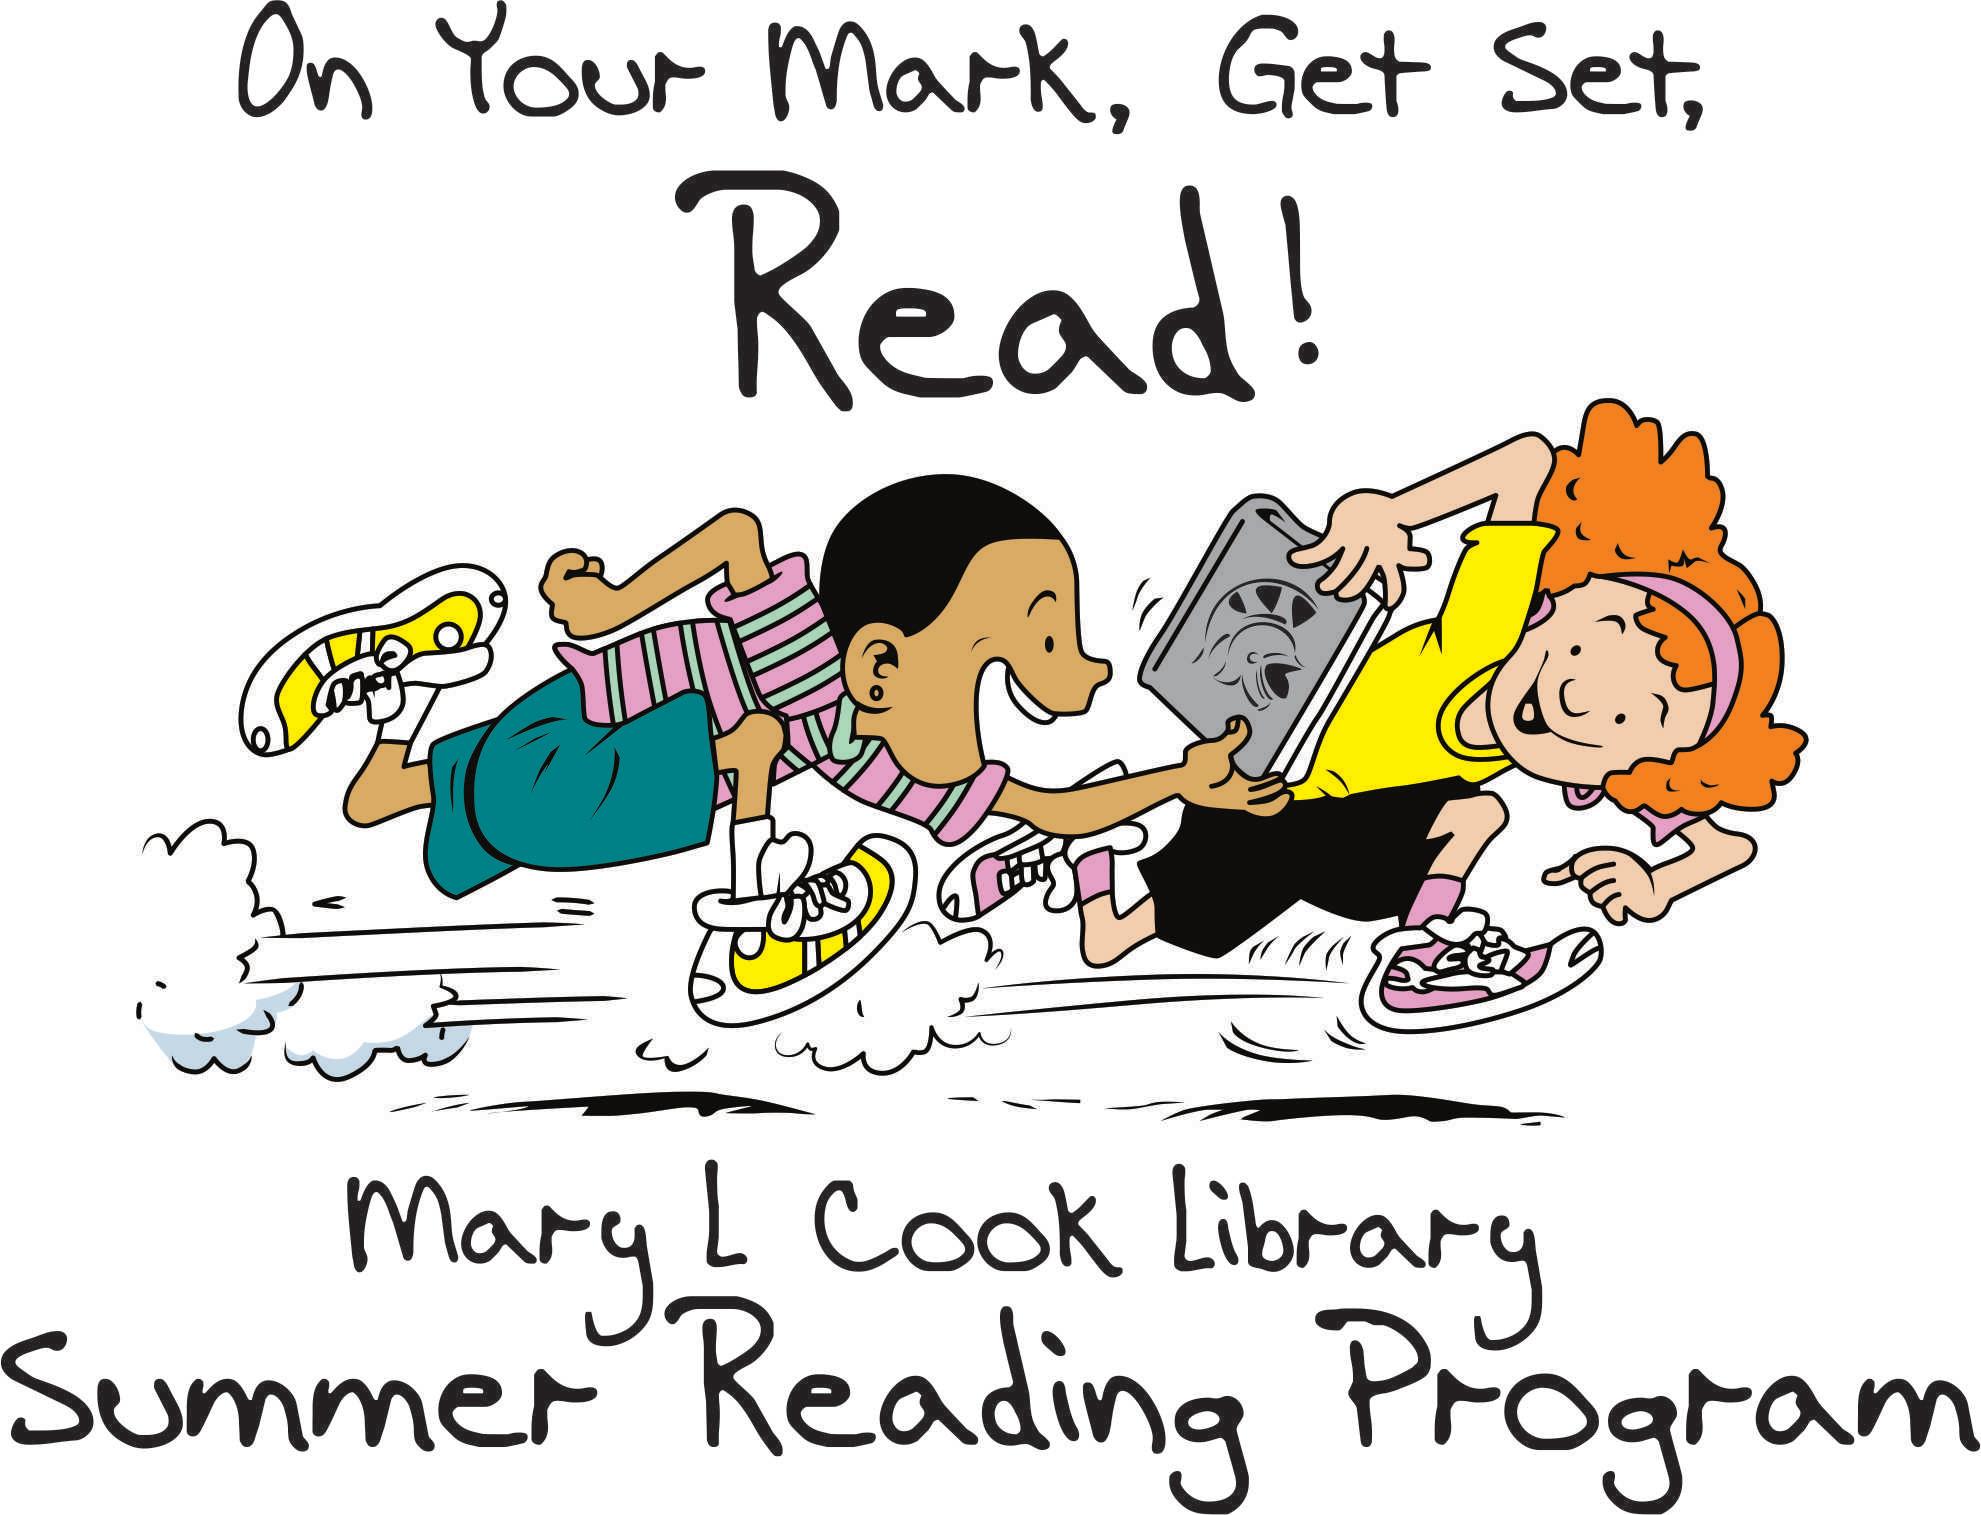 waynesville-library-reading-program2